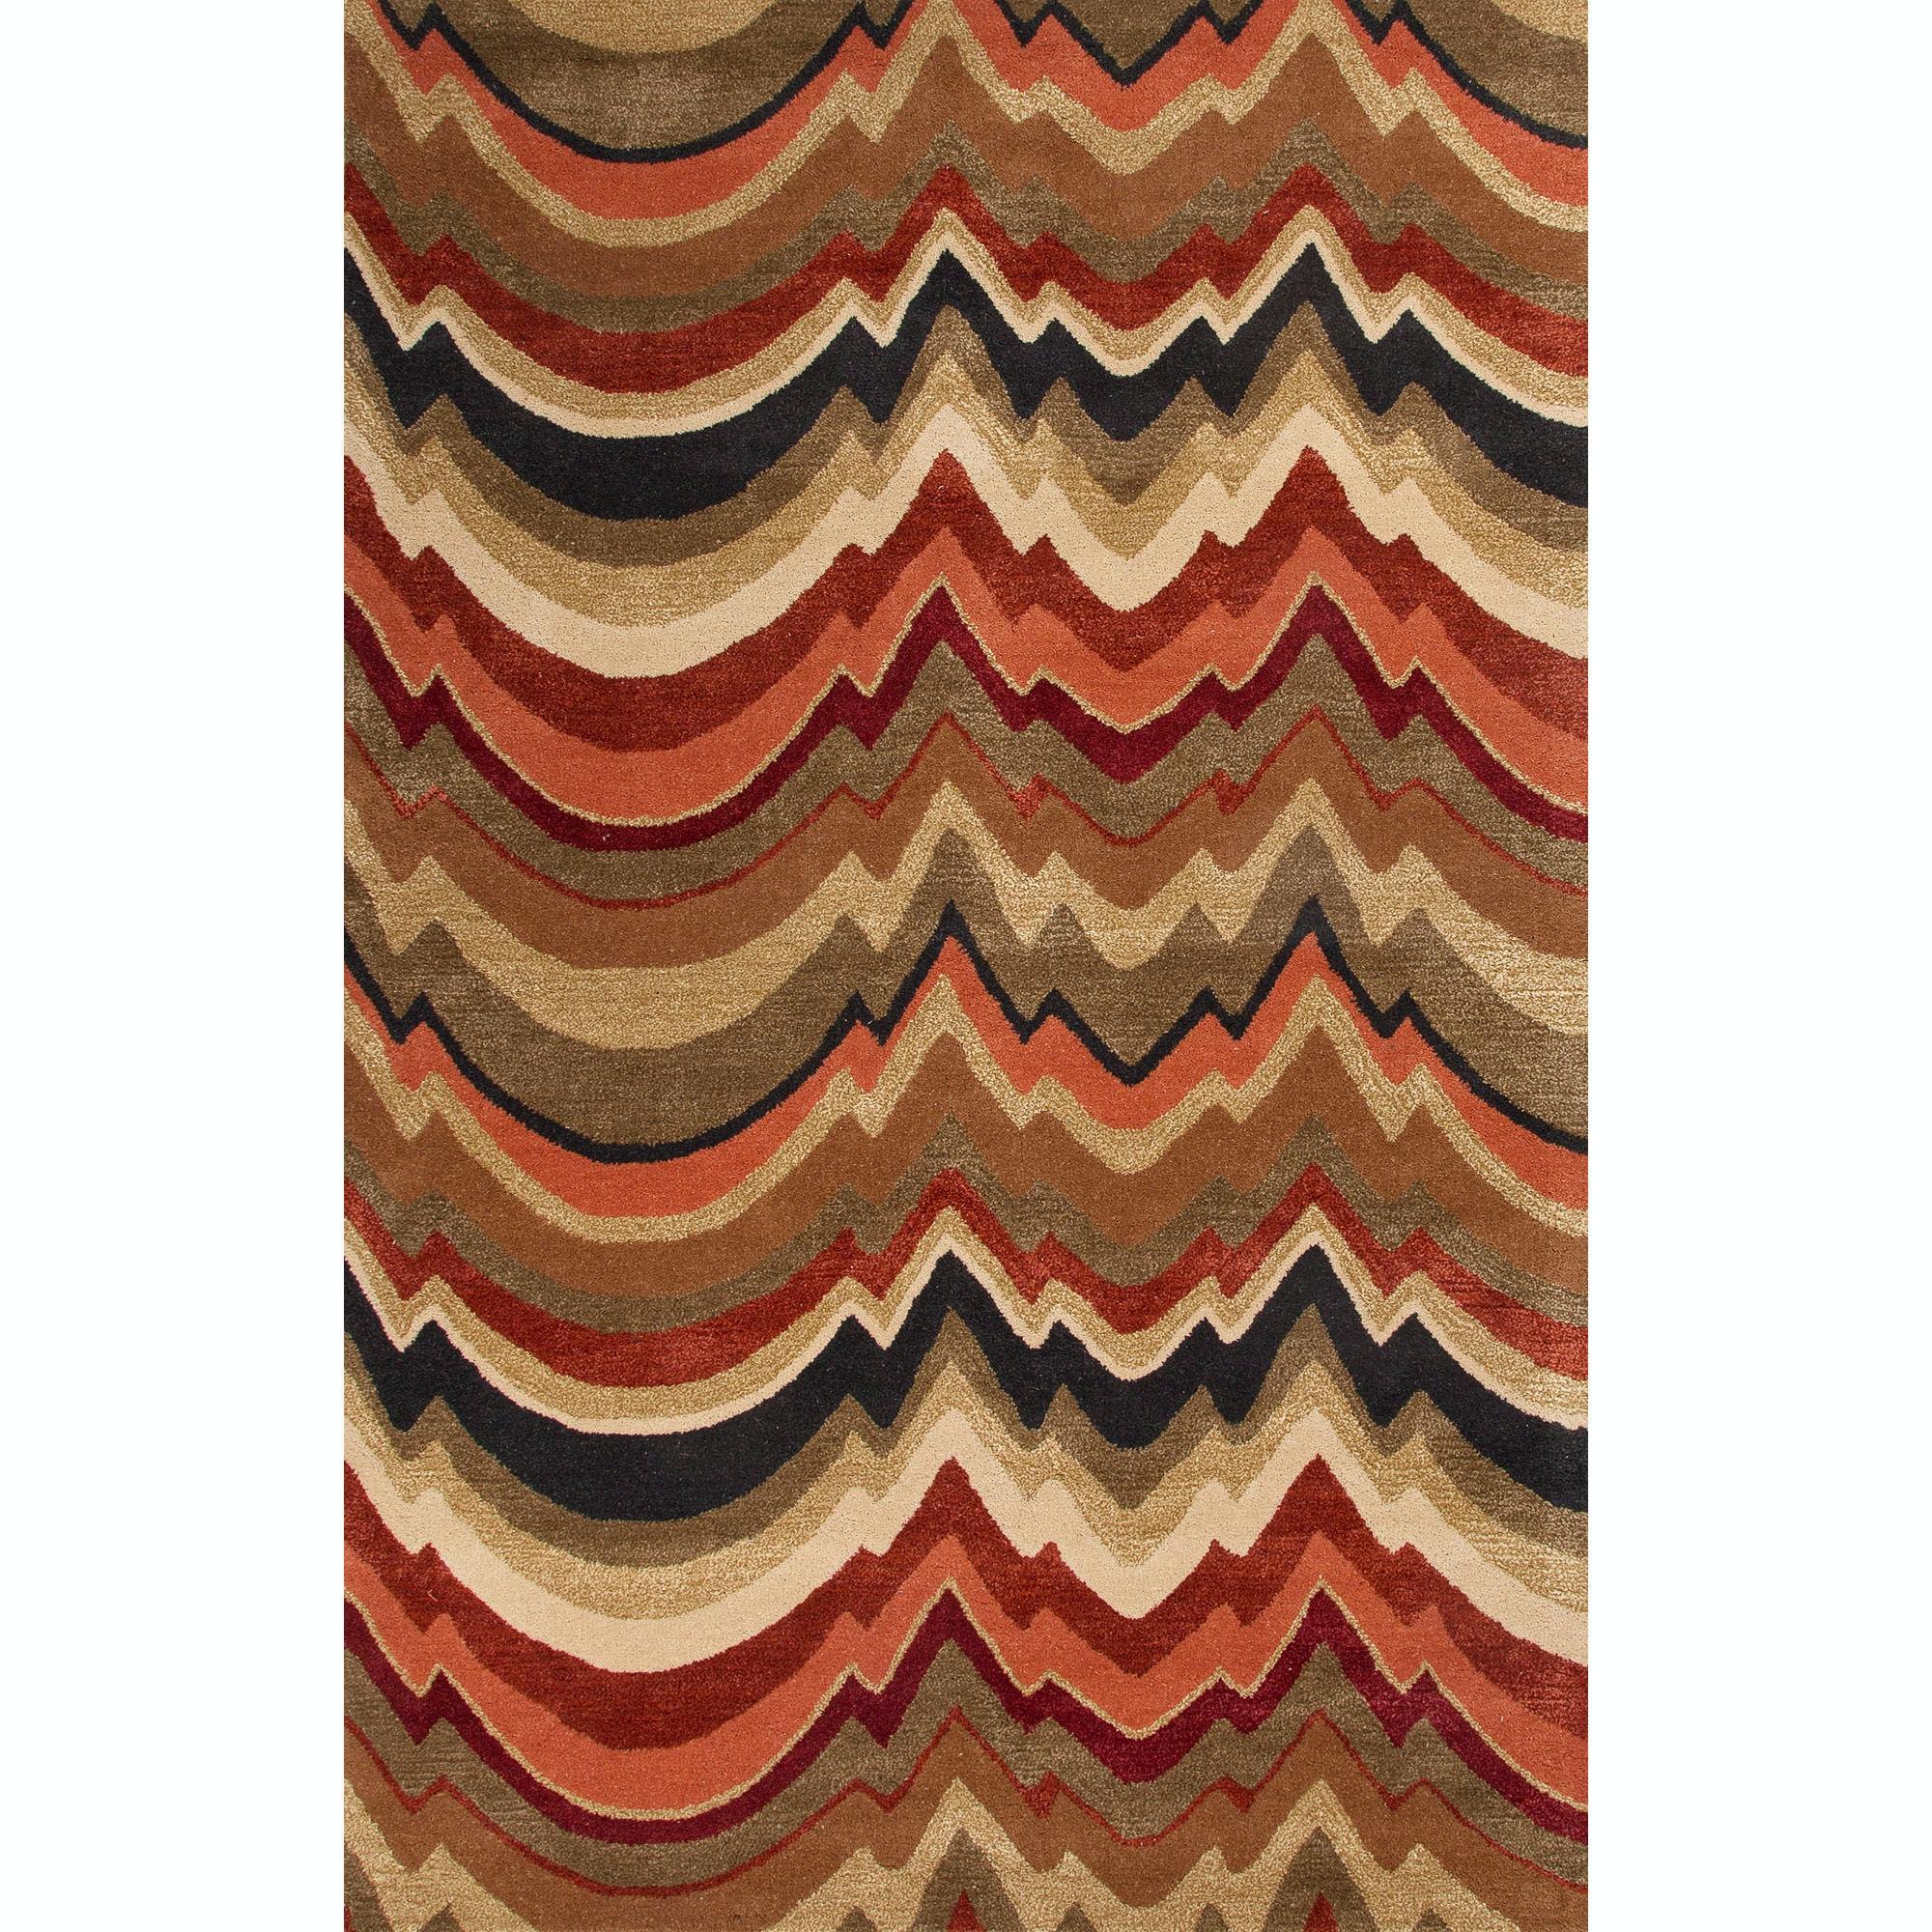 Jaipur Rugs Floor Coverings Hand Tufted Soft Hand Wool Art Silk